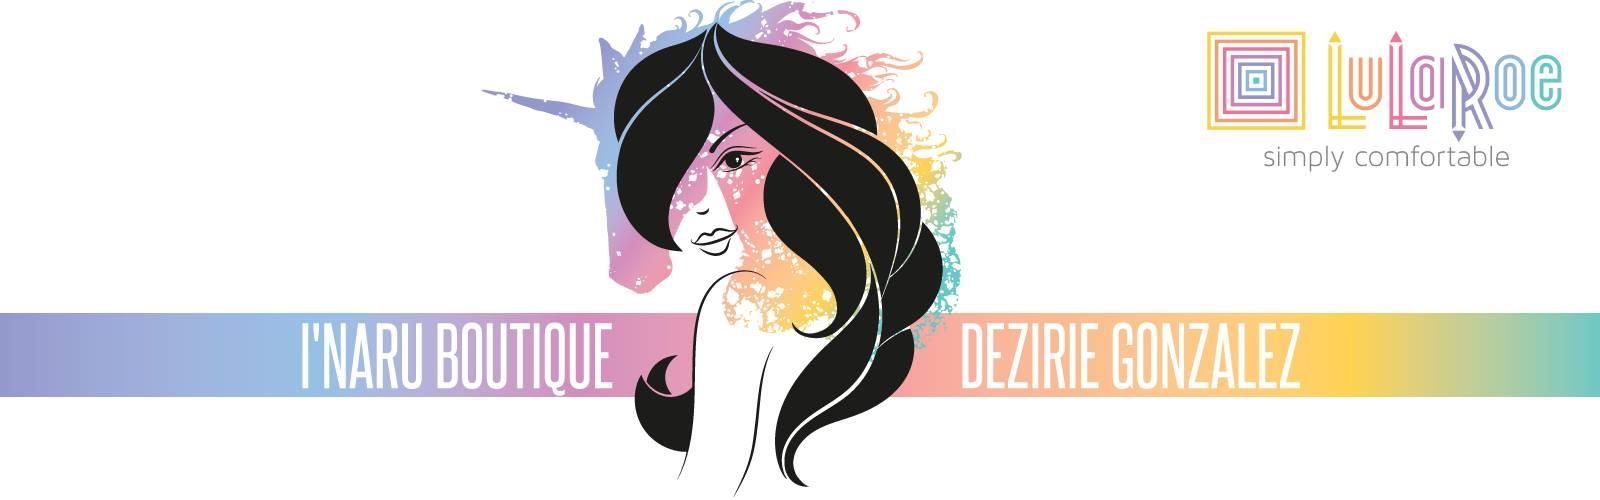 Lularoedezirieg (@inaruboutique) Cover Image